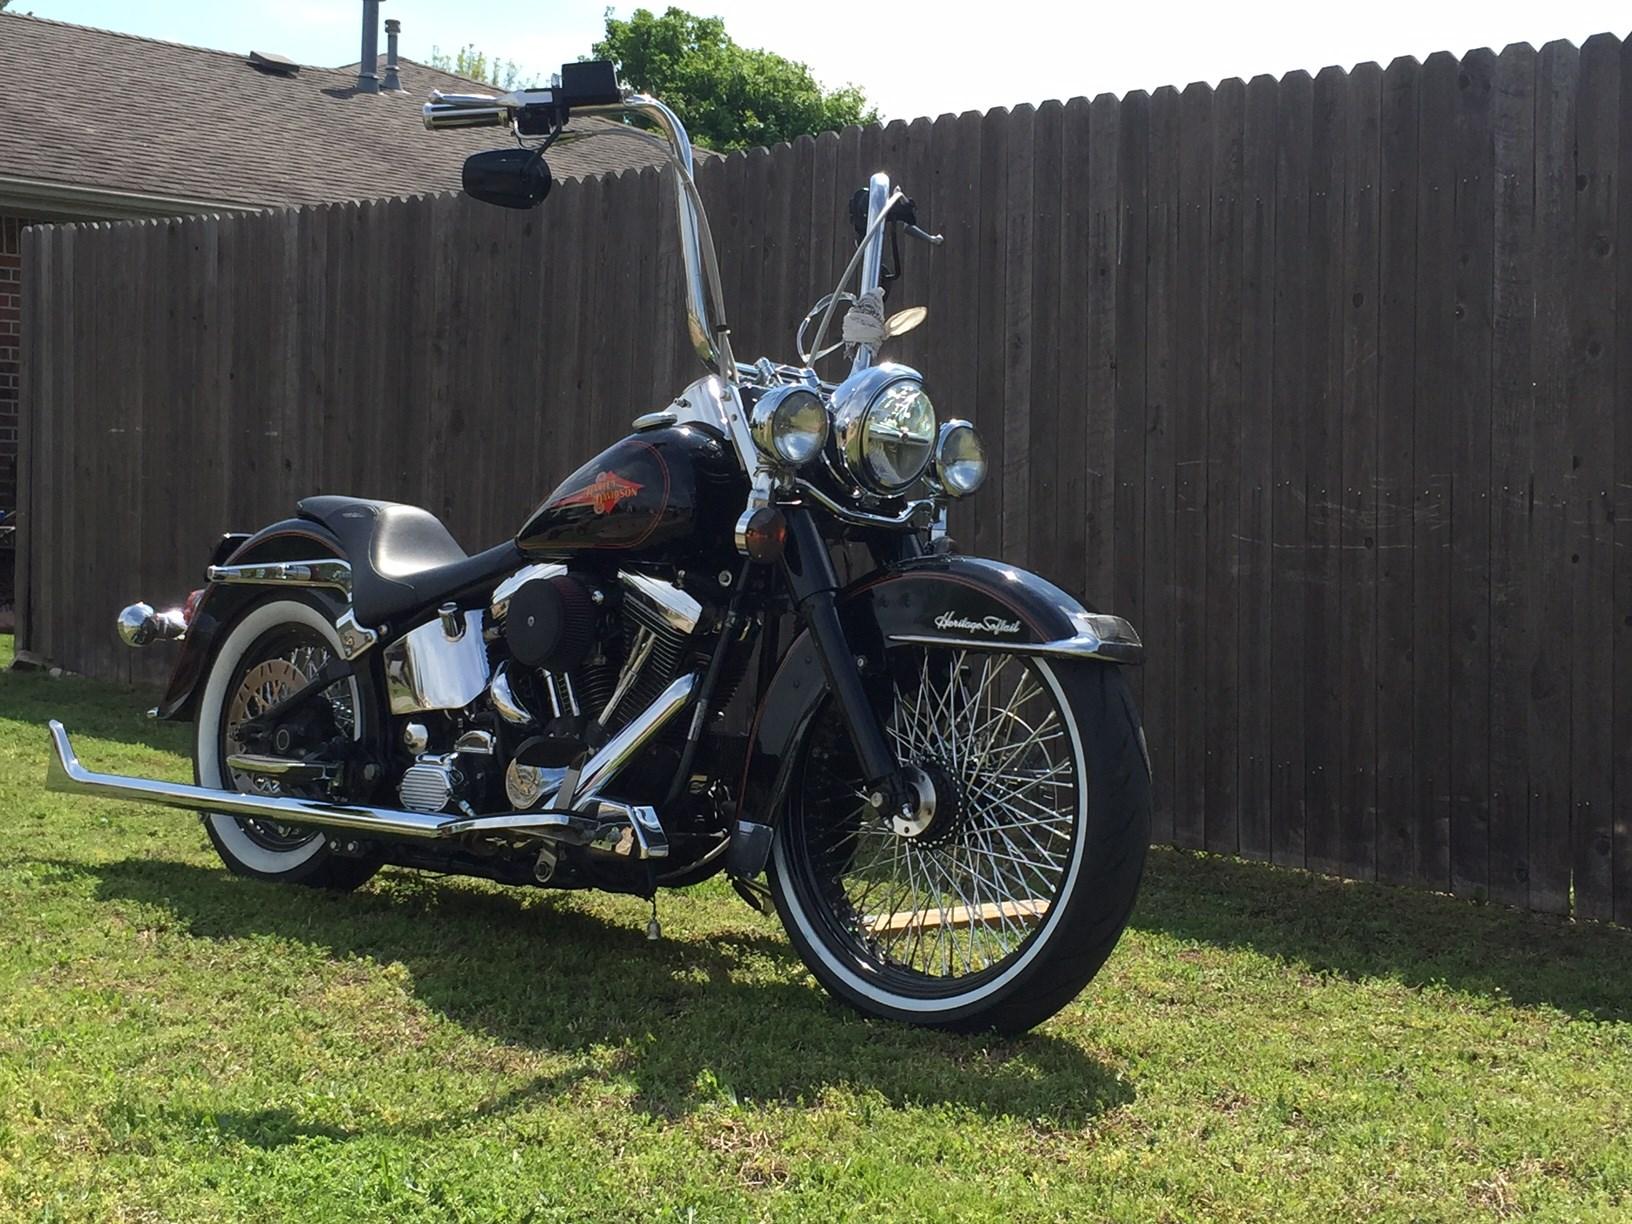 1993 Harley Davidson 174 Flstc Heritage Softail 174 Classic